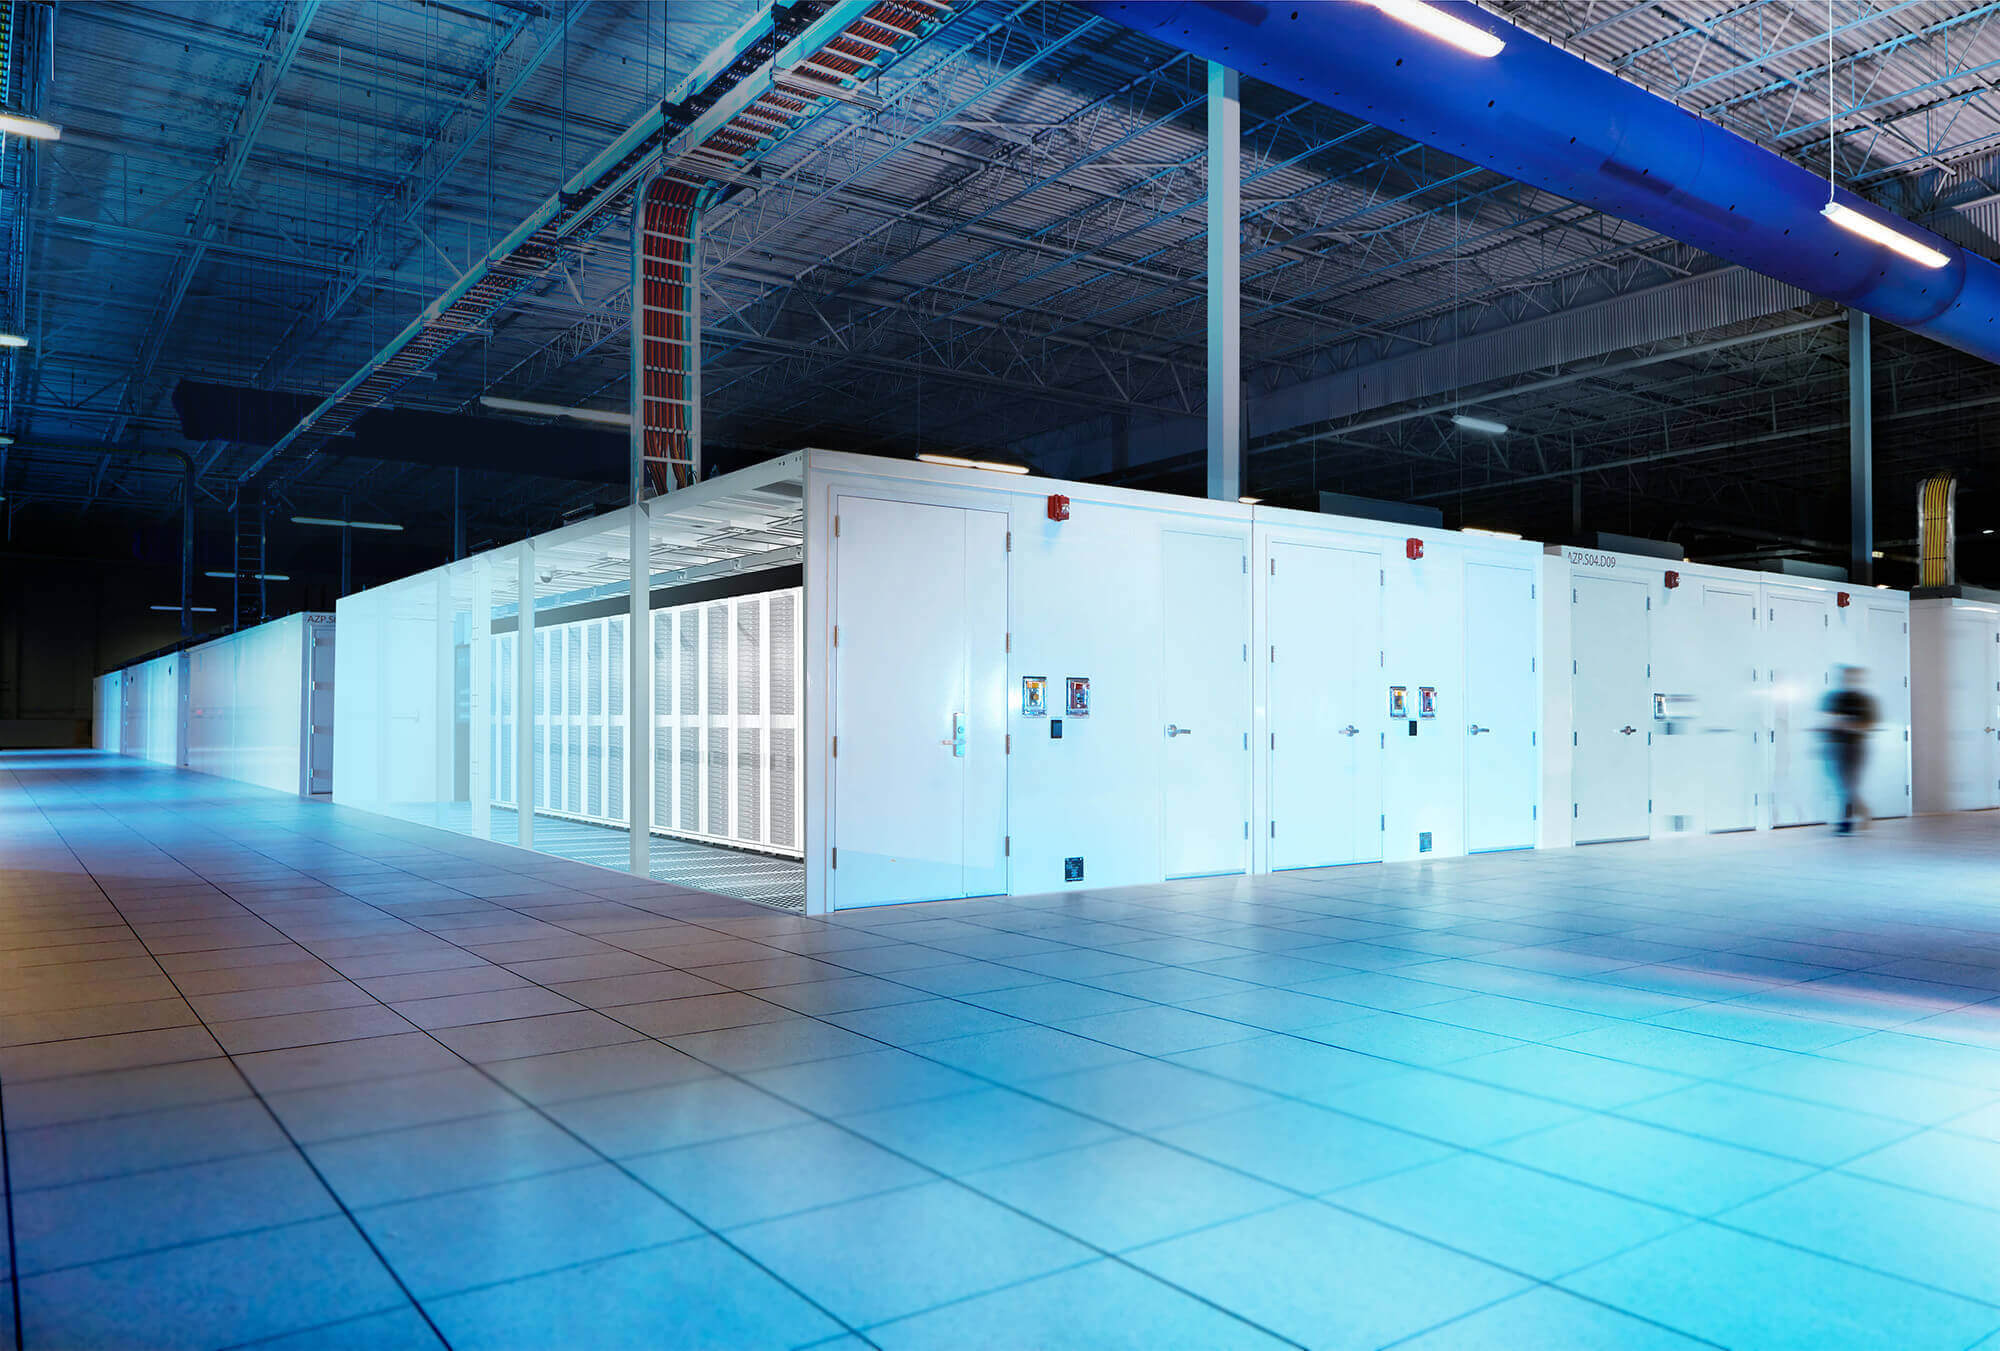 New ASHRAE Standard – Impact on the Data Center Industry